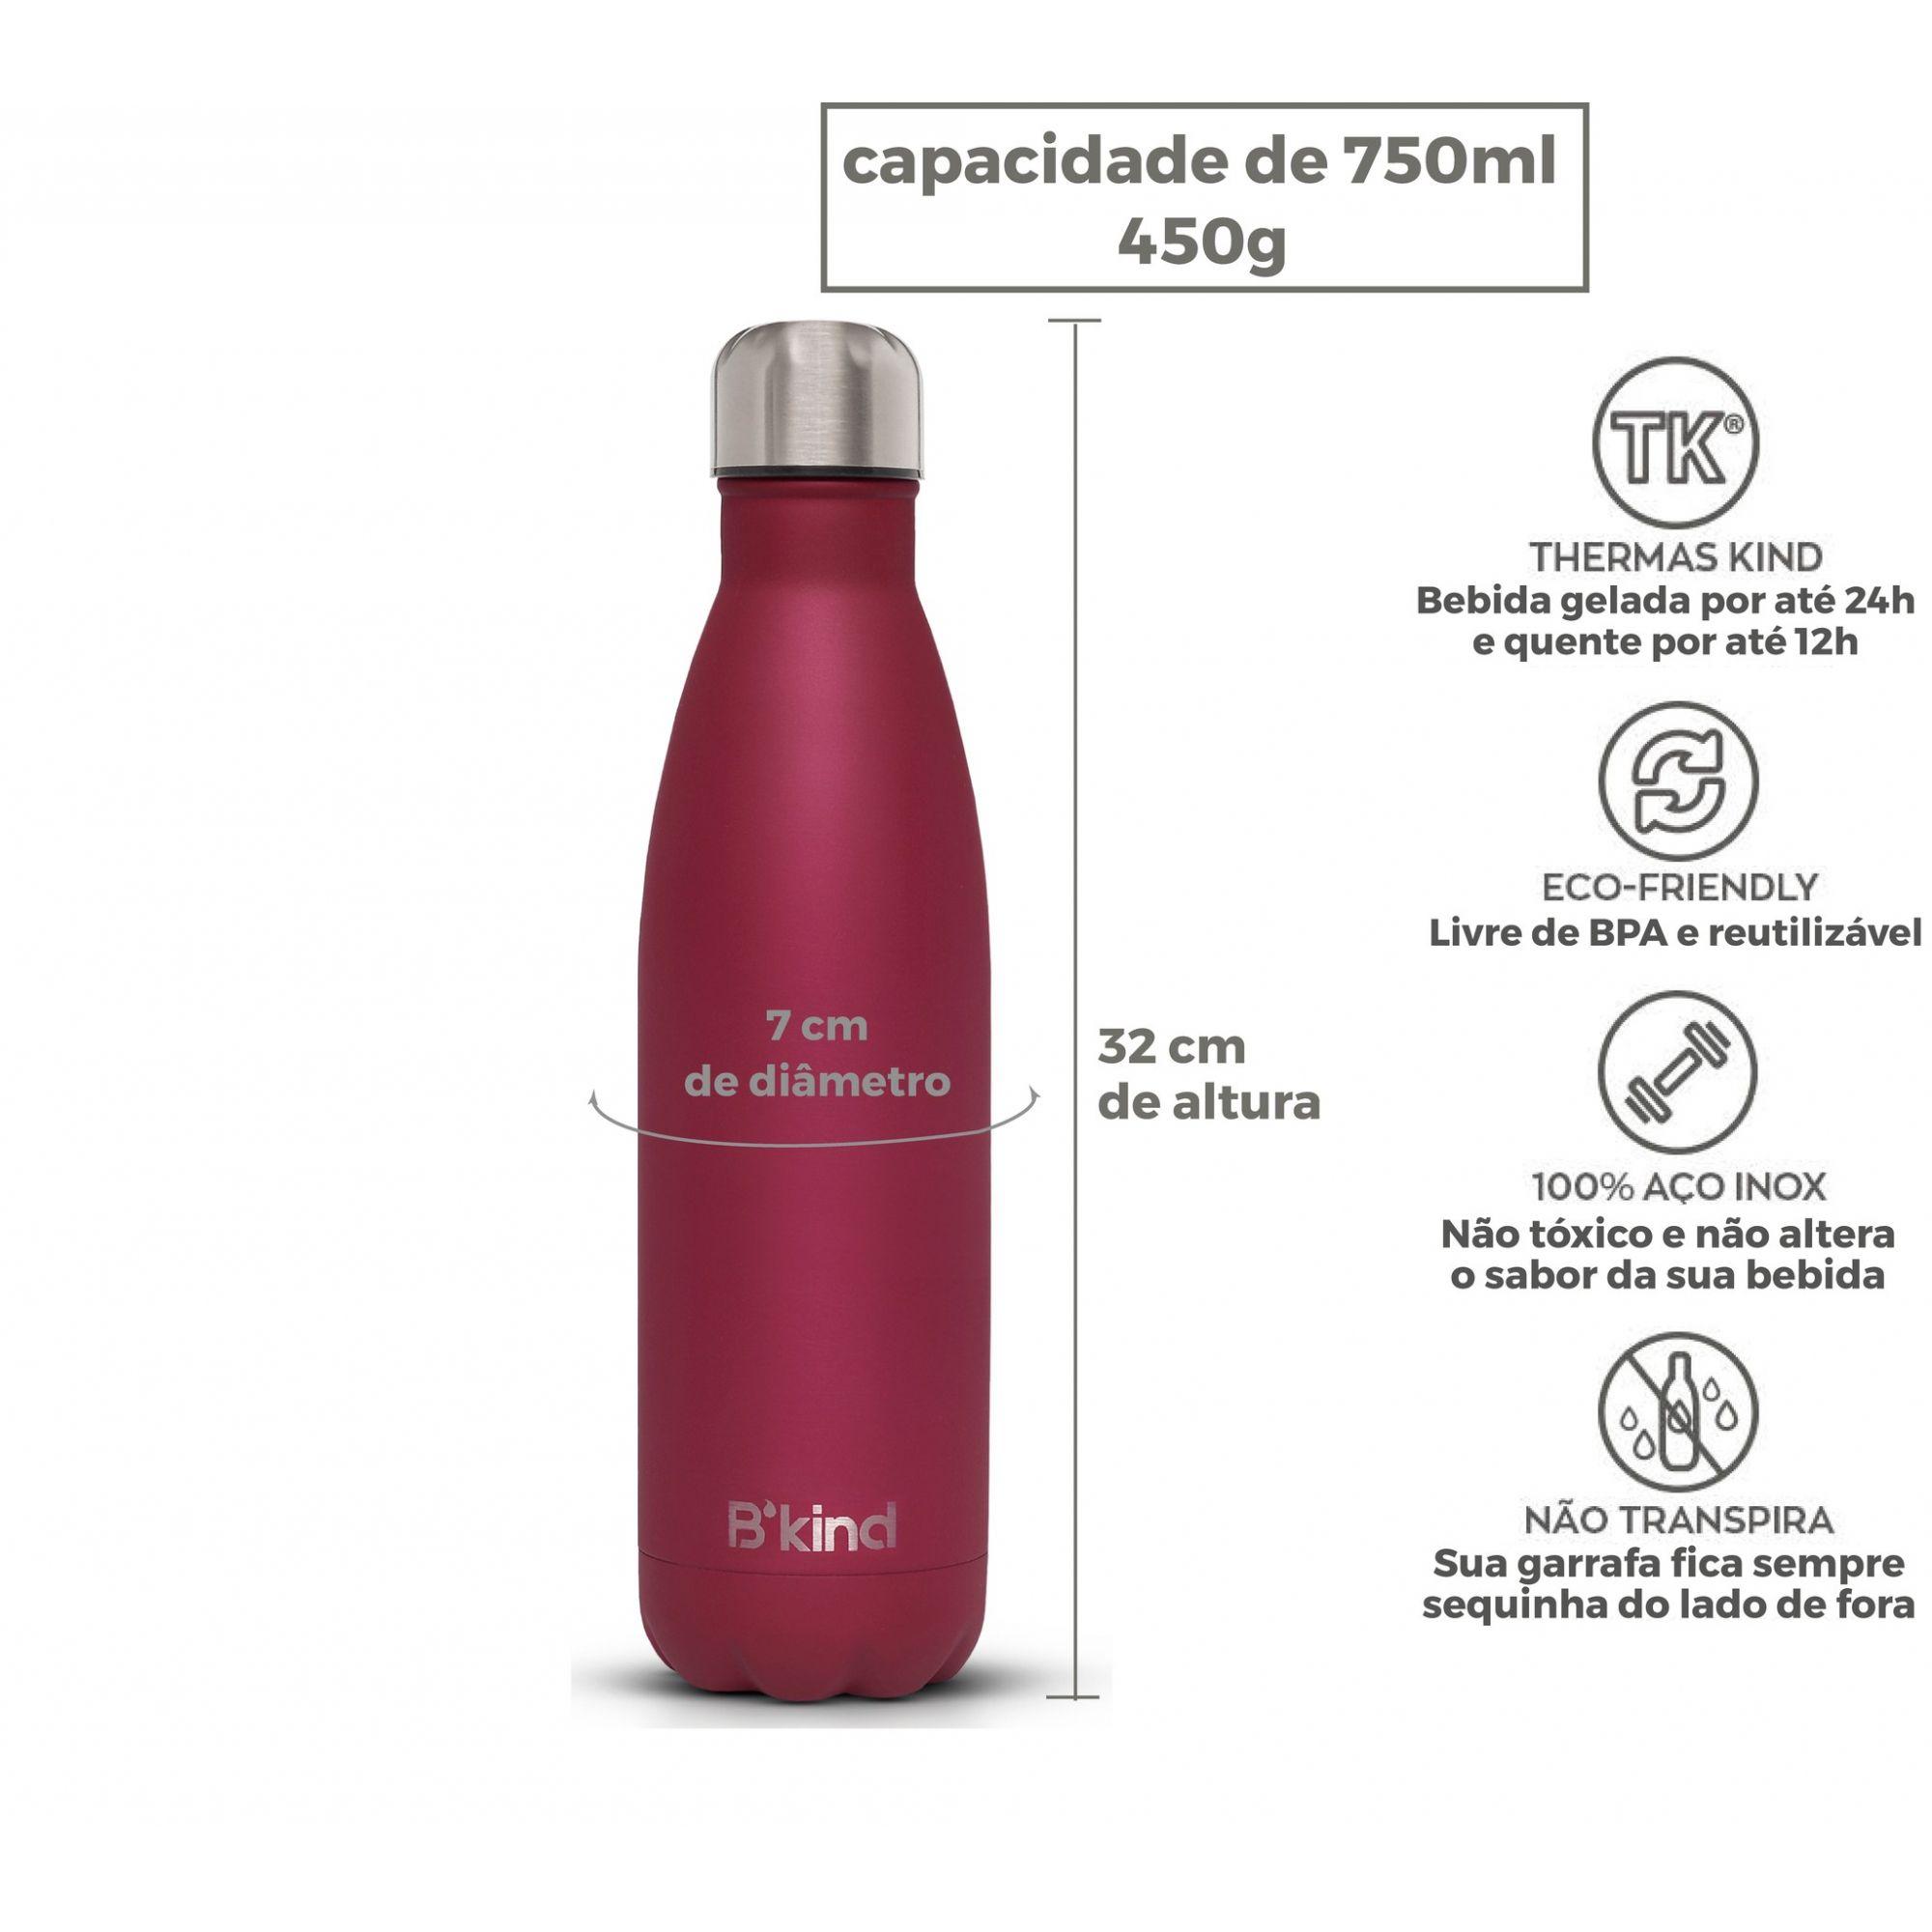 Garrafa Térmica B'kind Rouge Passion 500ml + 750ml